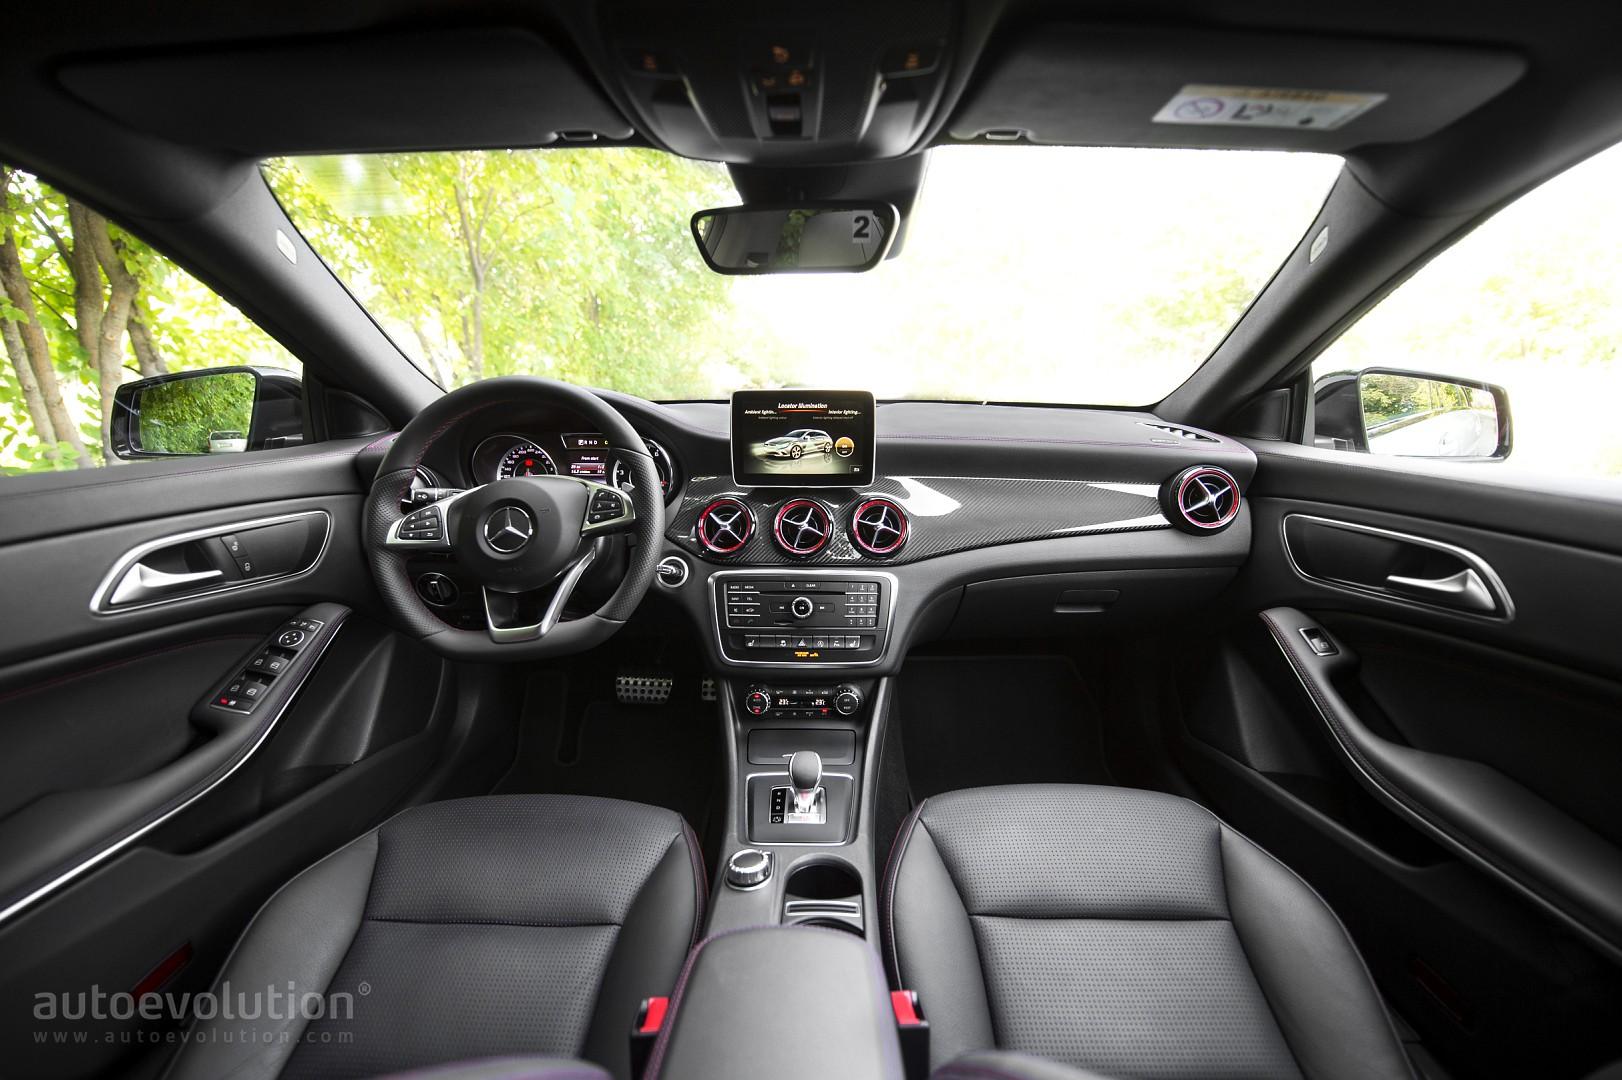 2016 mercedes benz cla45 amg shooting brake review autoevolution. Black Bedroom Furniture Sets. Home Design Ideas